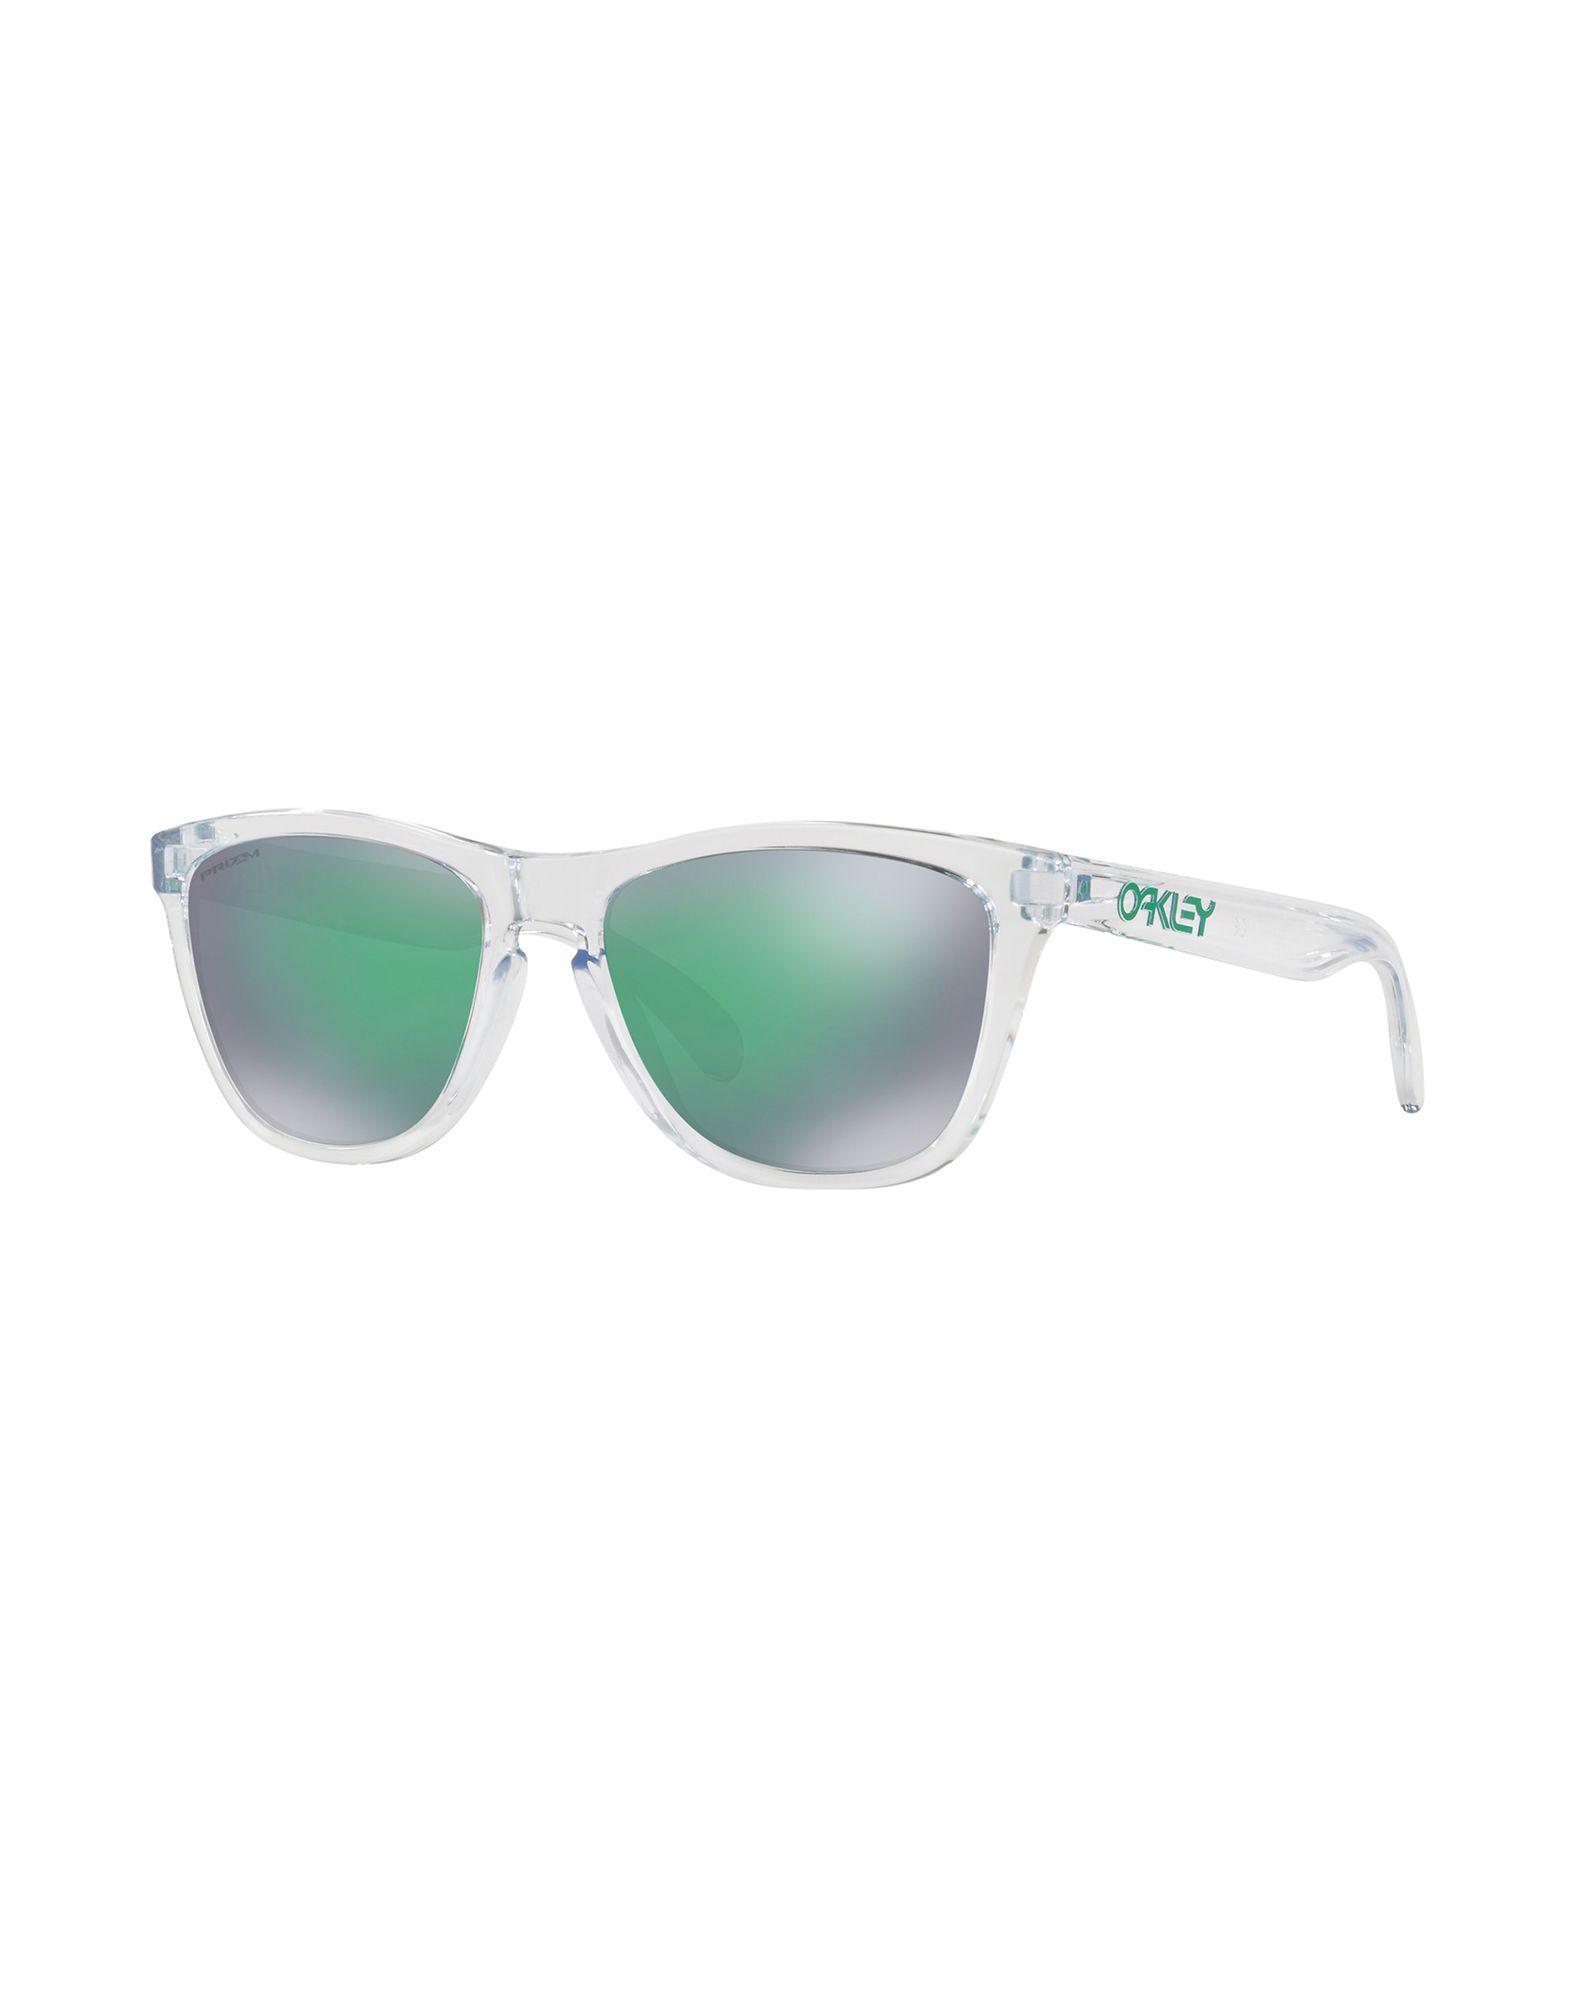 OAKLEY Солнечные очки солнцезащитные очки oakley holbrook oo9244 04